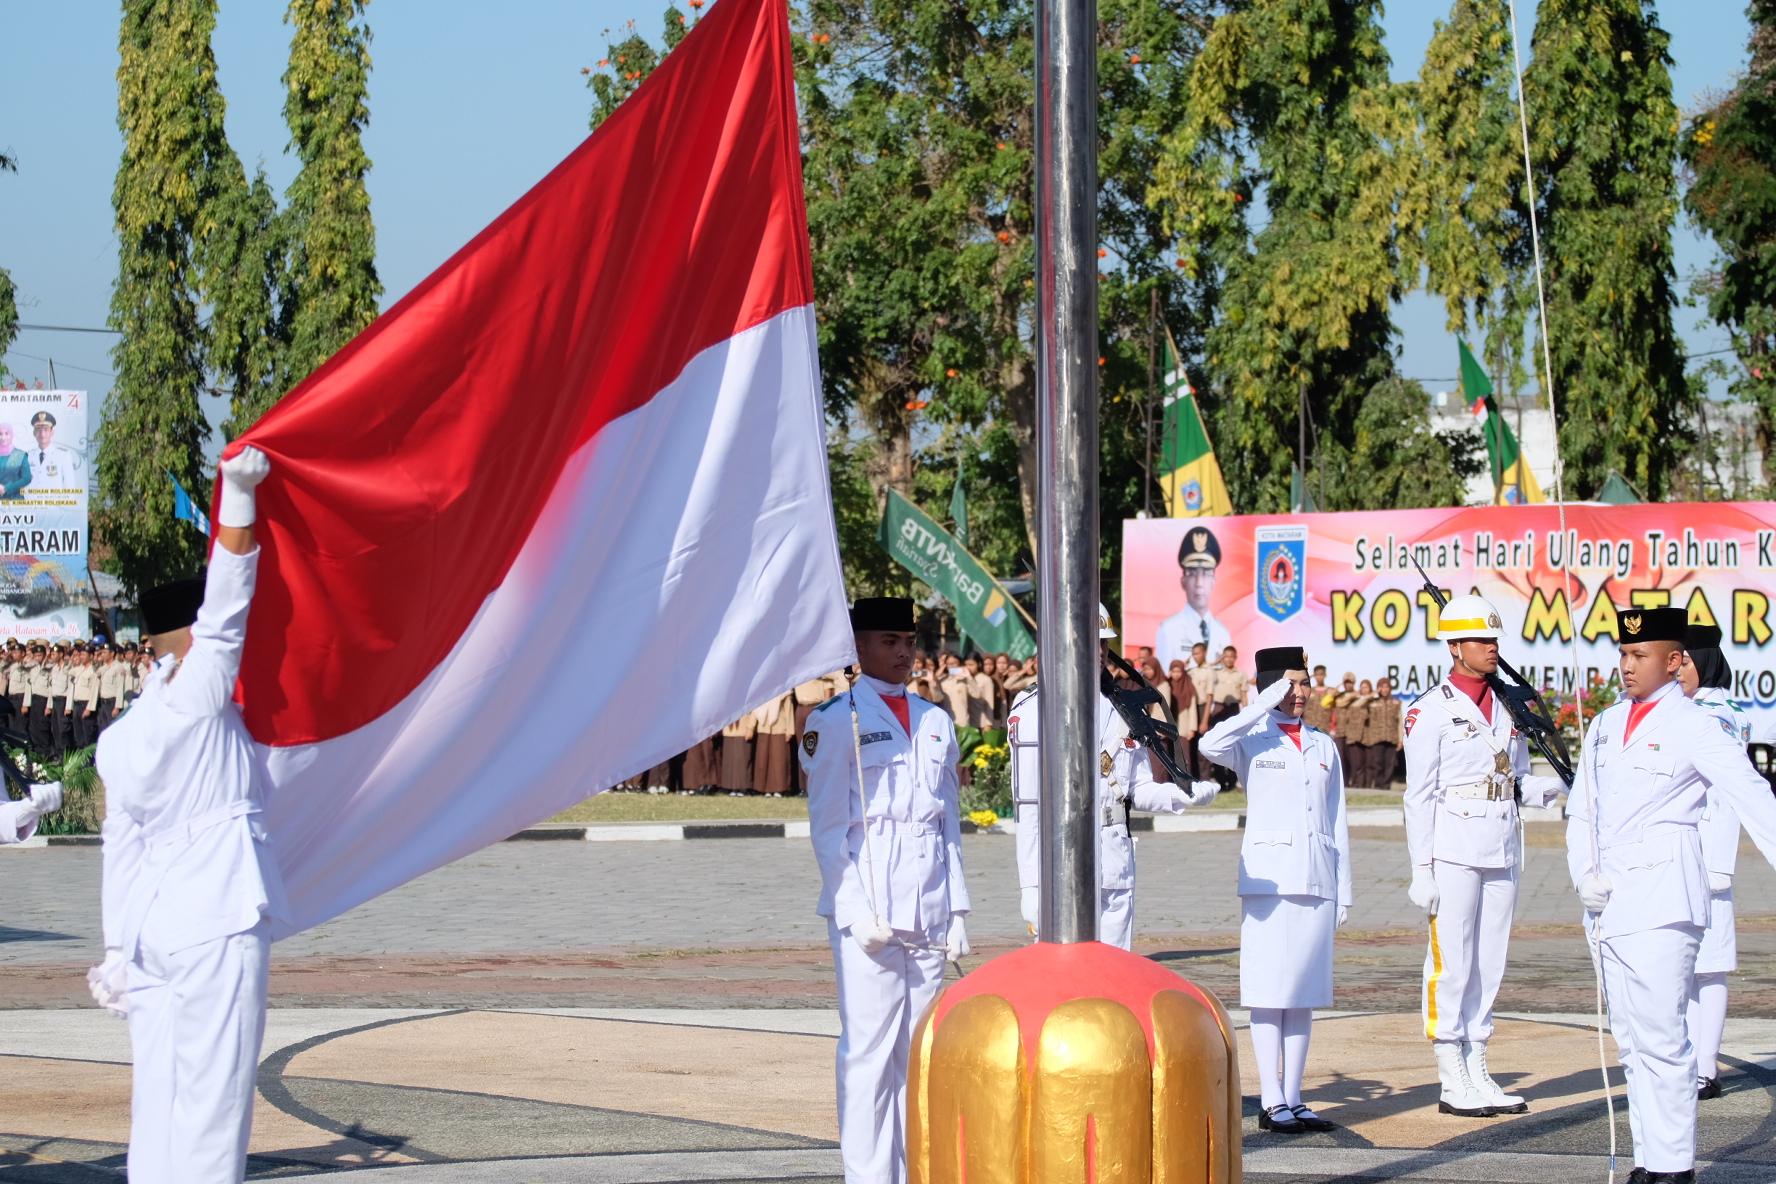 SAMBUTAN GUBERNUR NTB PADA ACARA  PERINGATAN ULANG TAHUN KE-26 KOTA MATARAM